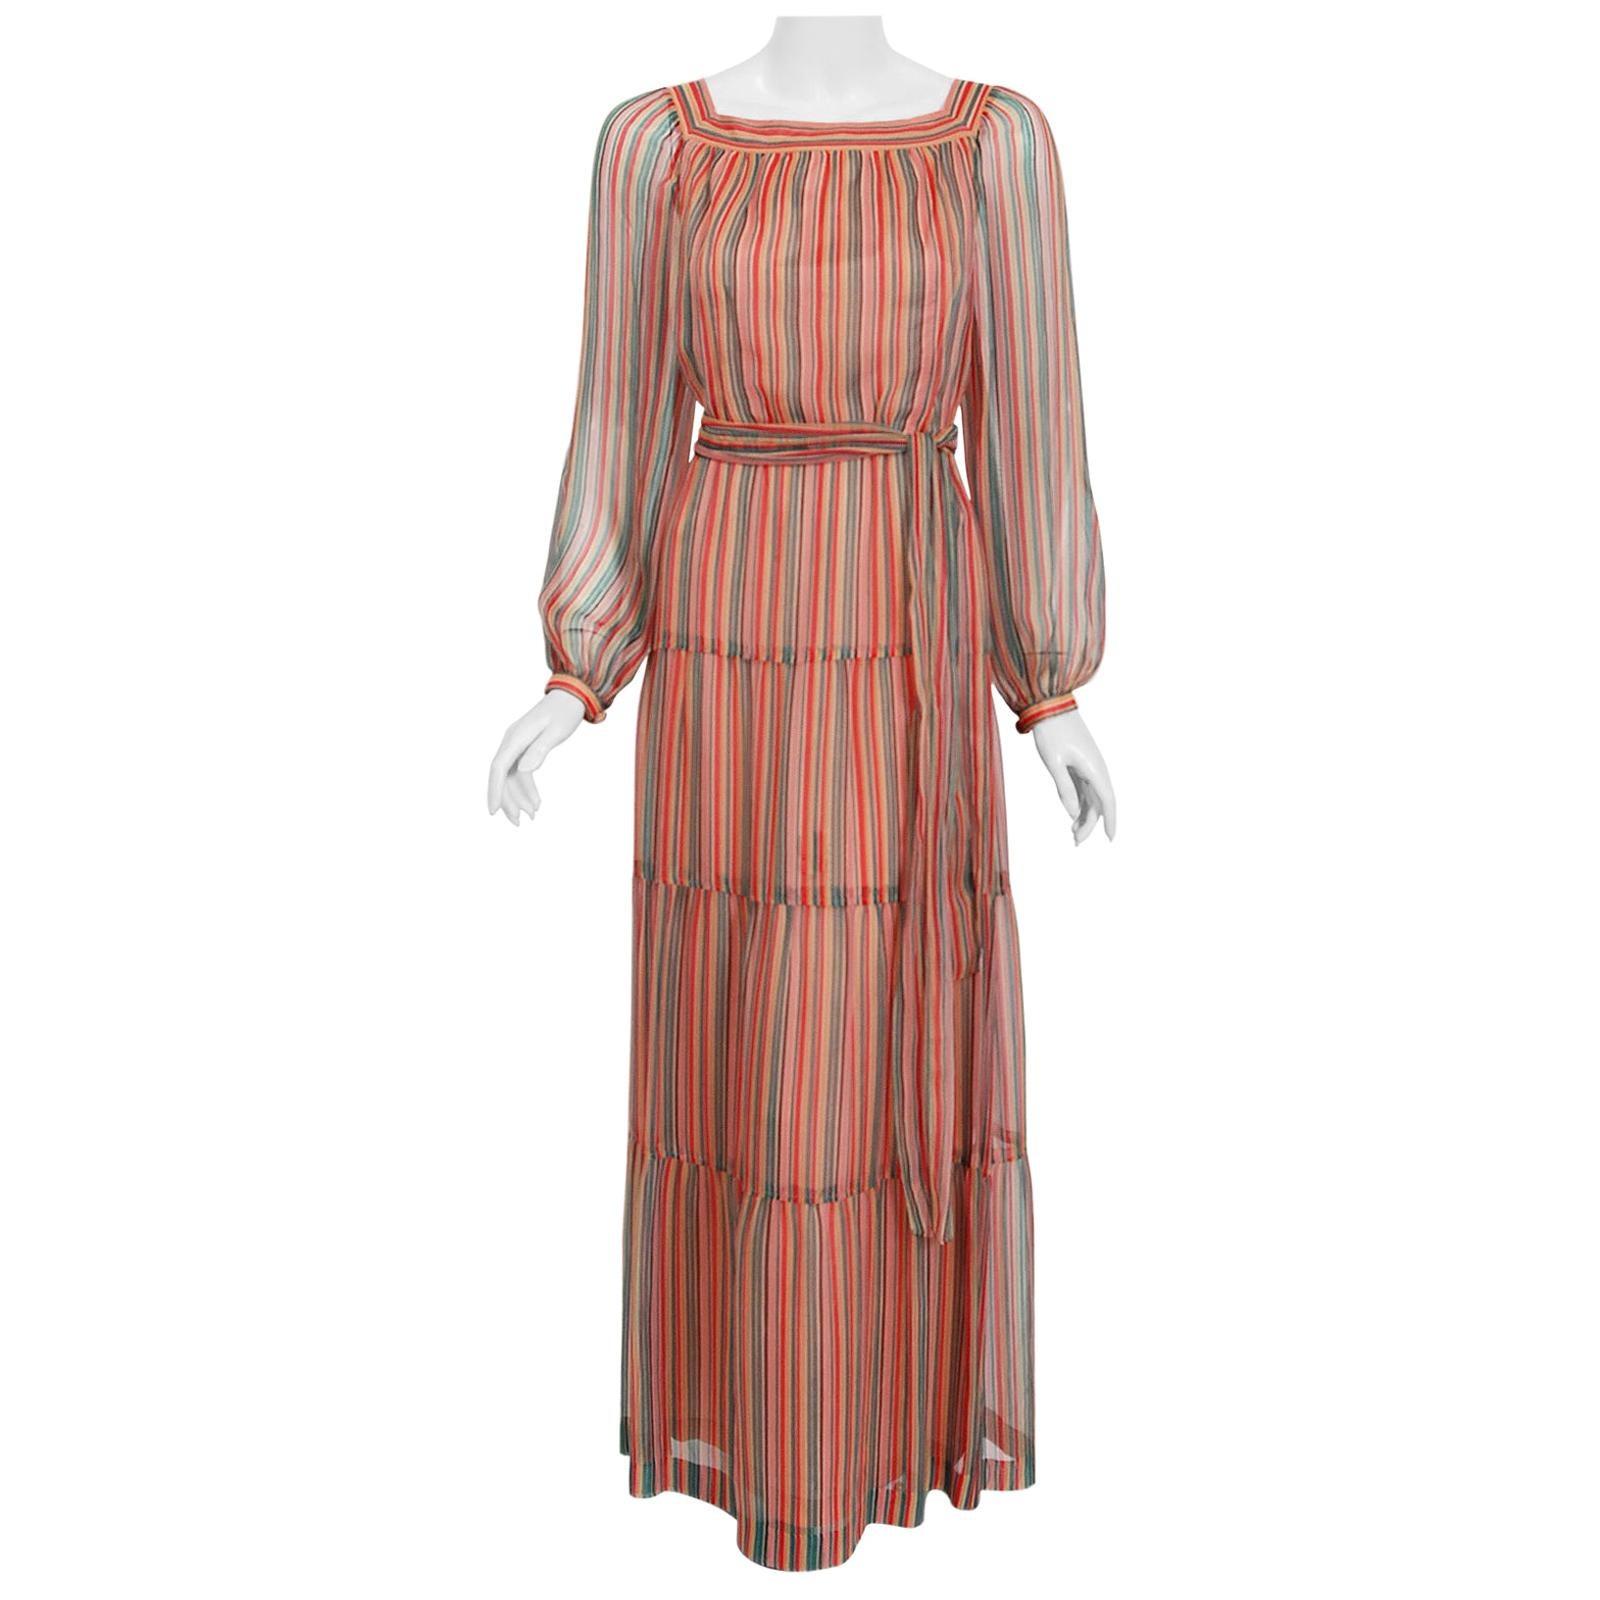 Vintage 1977 Givenchy Colorful Stripe Silk-Chiffon Billow Sleeve Bohemian Dress